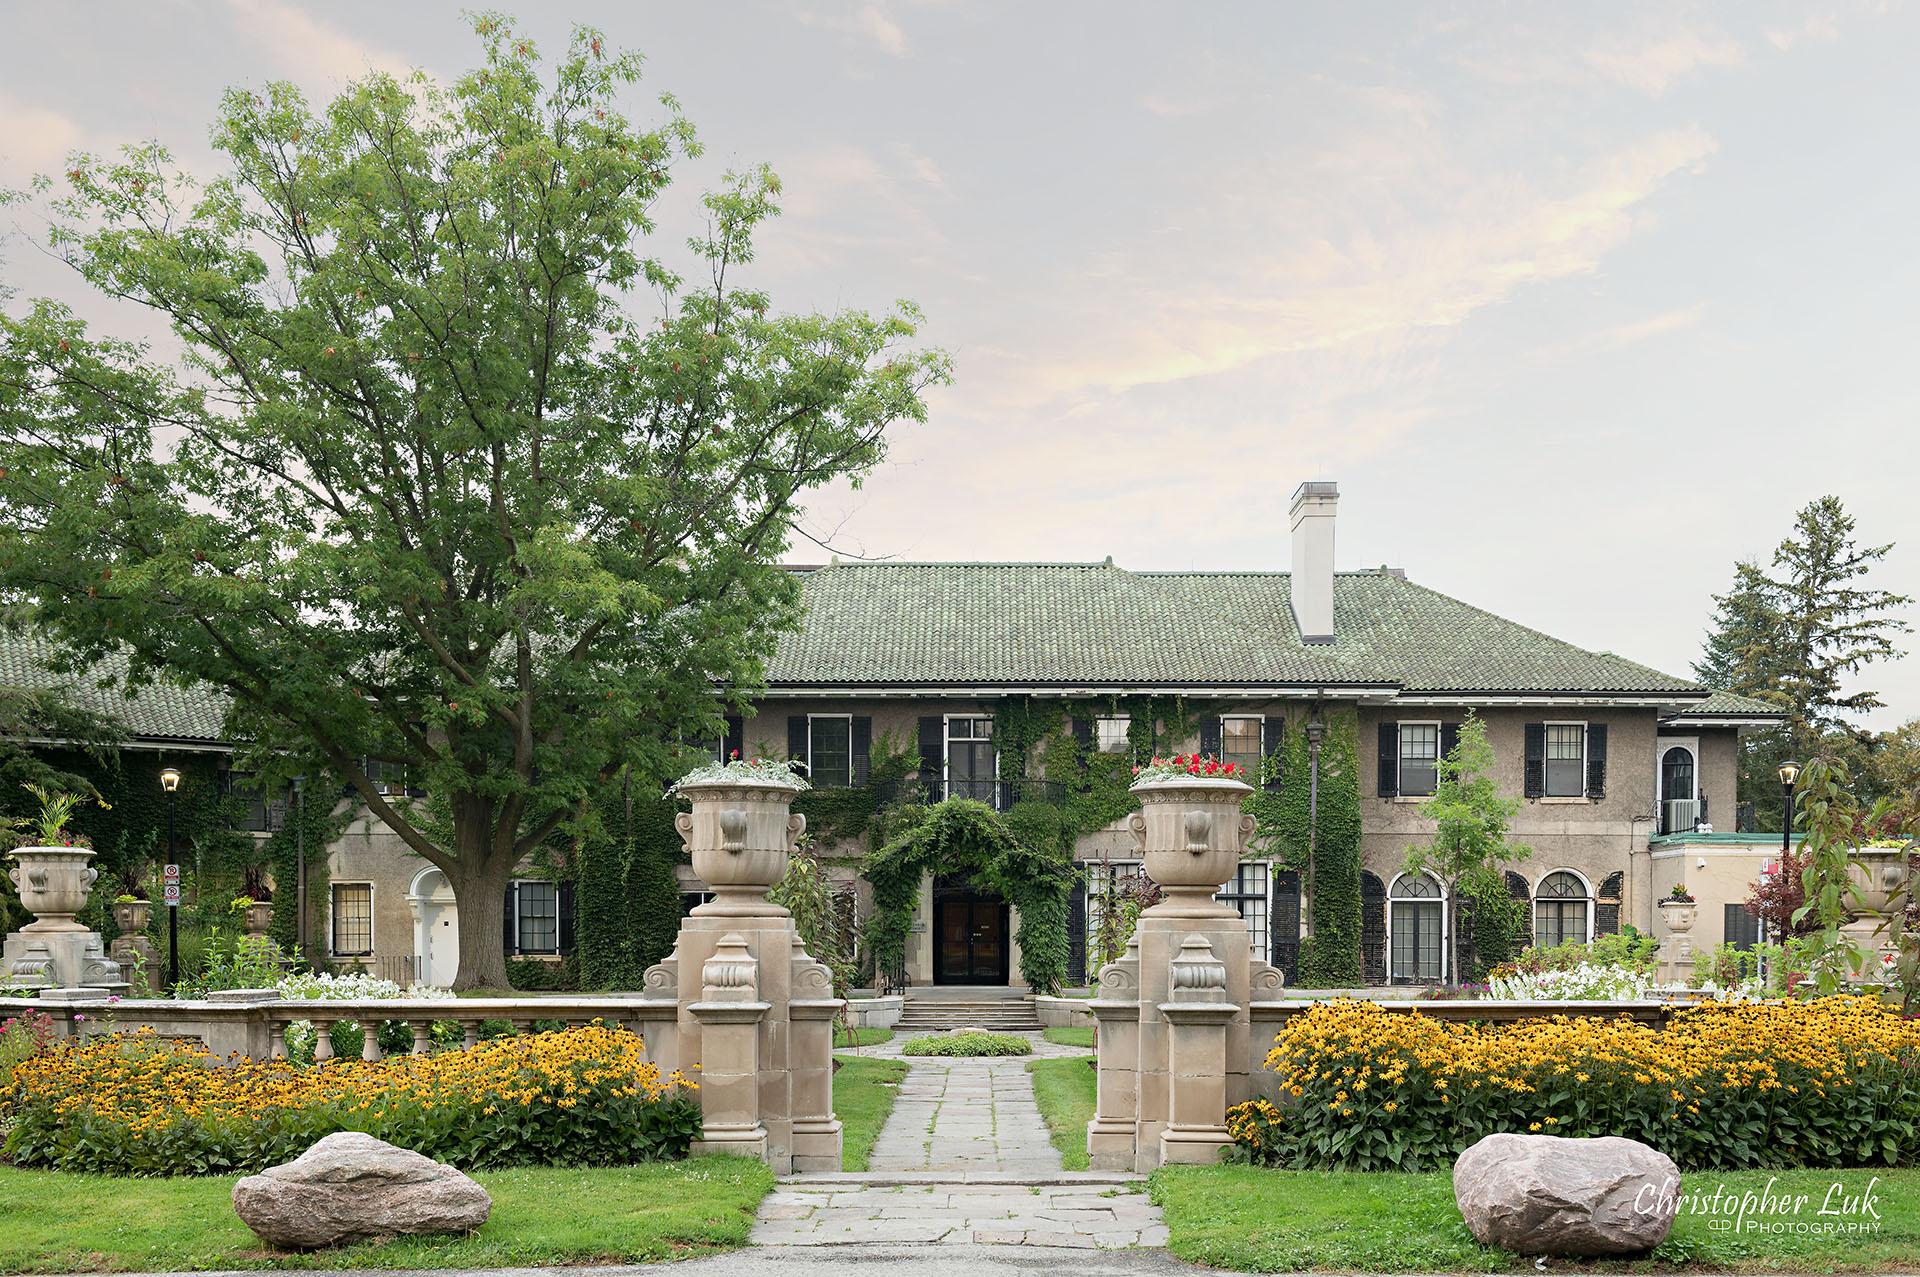 Christopher Luk Toronto Wedding Photographer Glendon Hall College Campus York University Engagement Session Garden Stone Architecture Estate Landscape